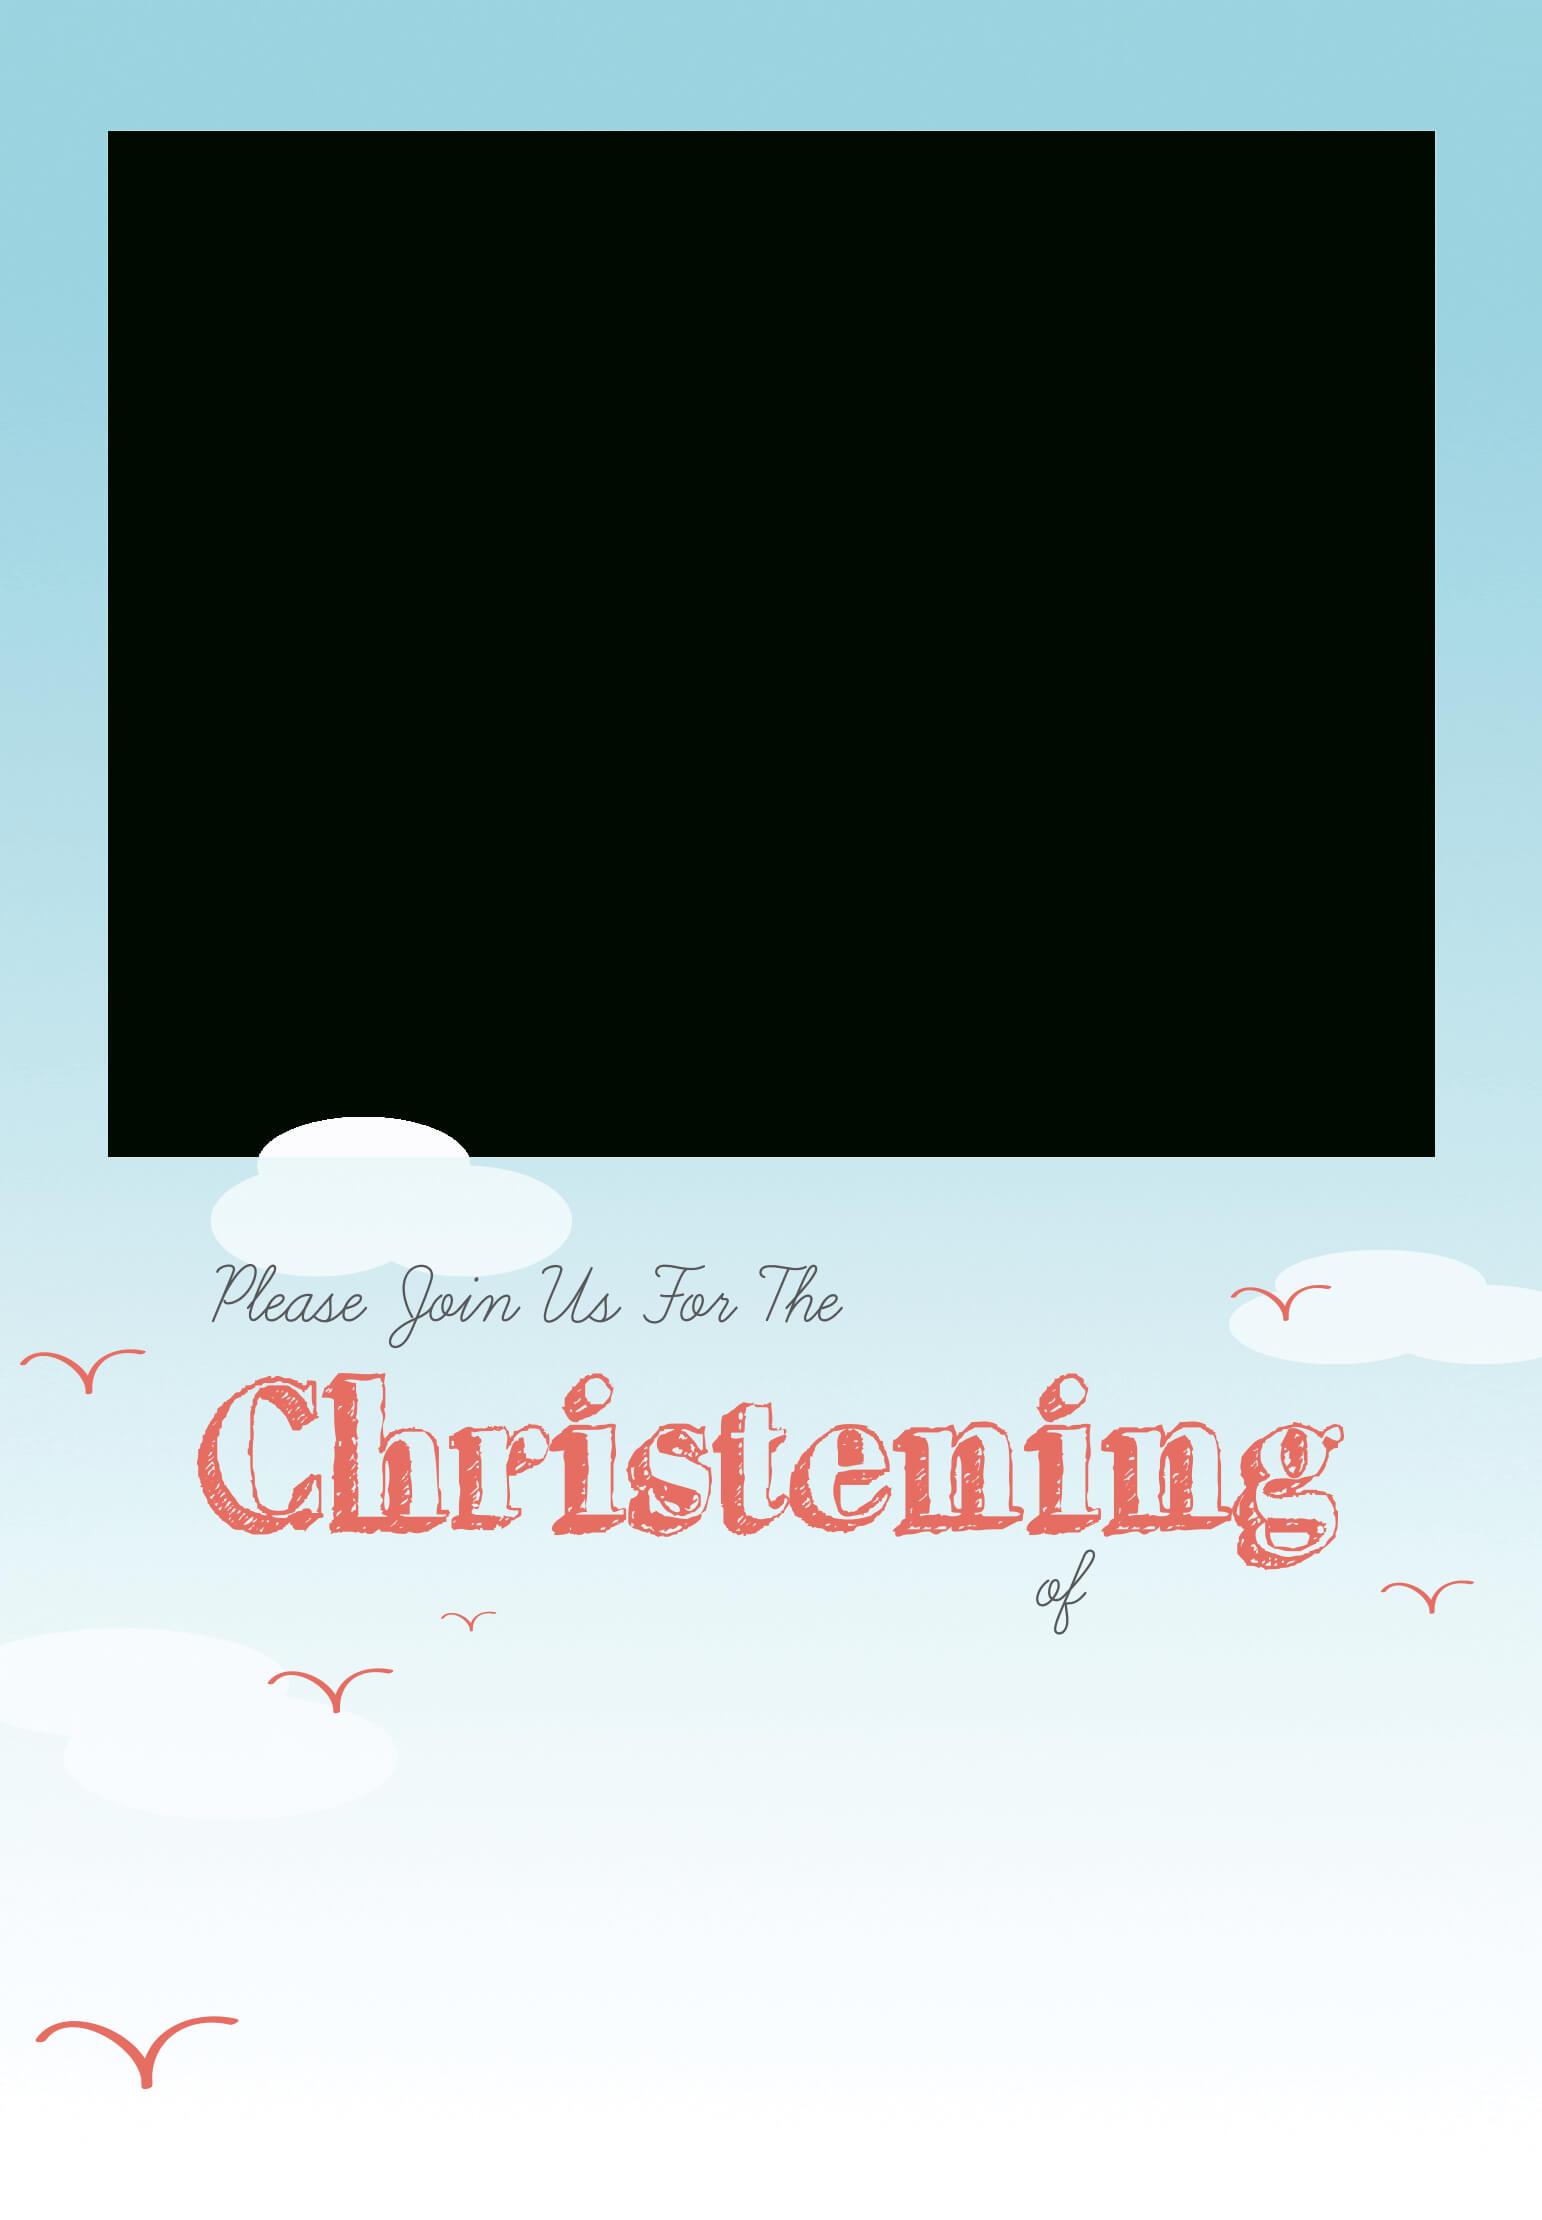 All Smiles - Baptism & Christening Invitation Template (Free In Blank Christening Invitation Templates